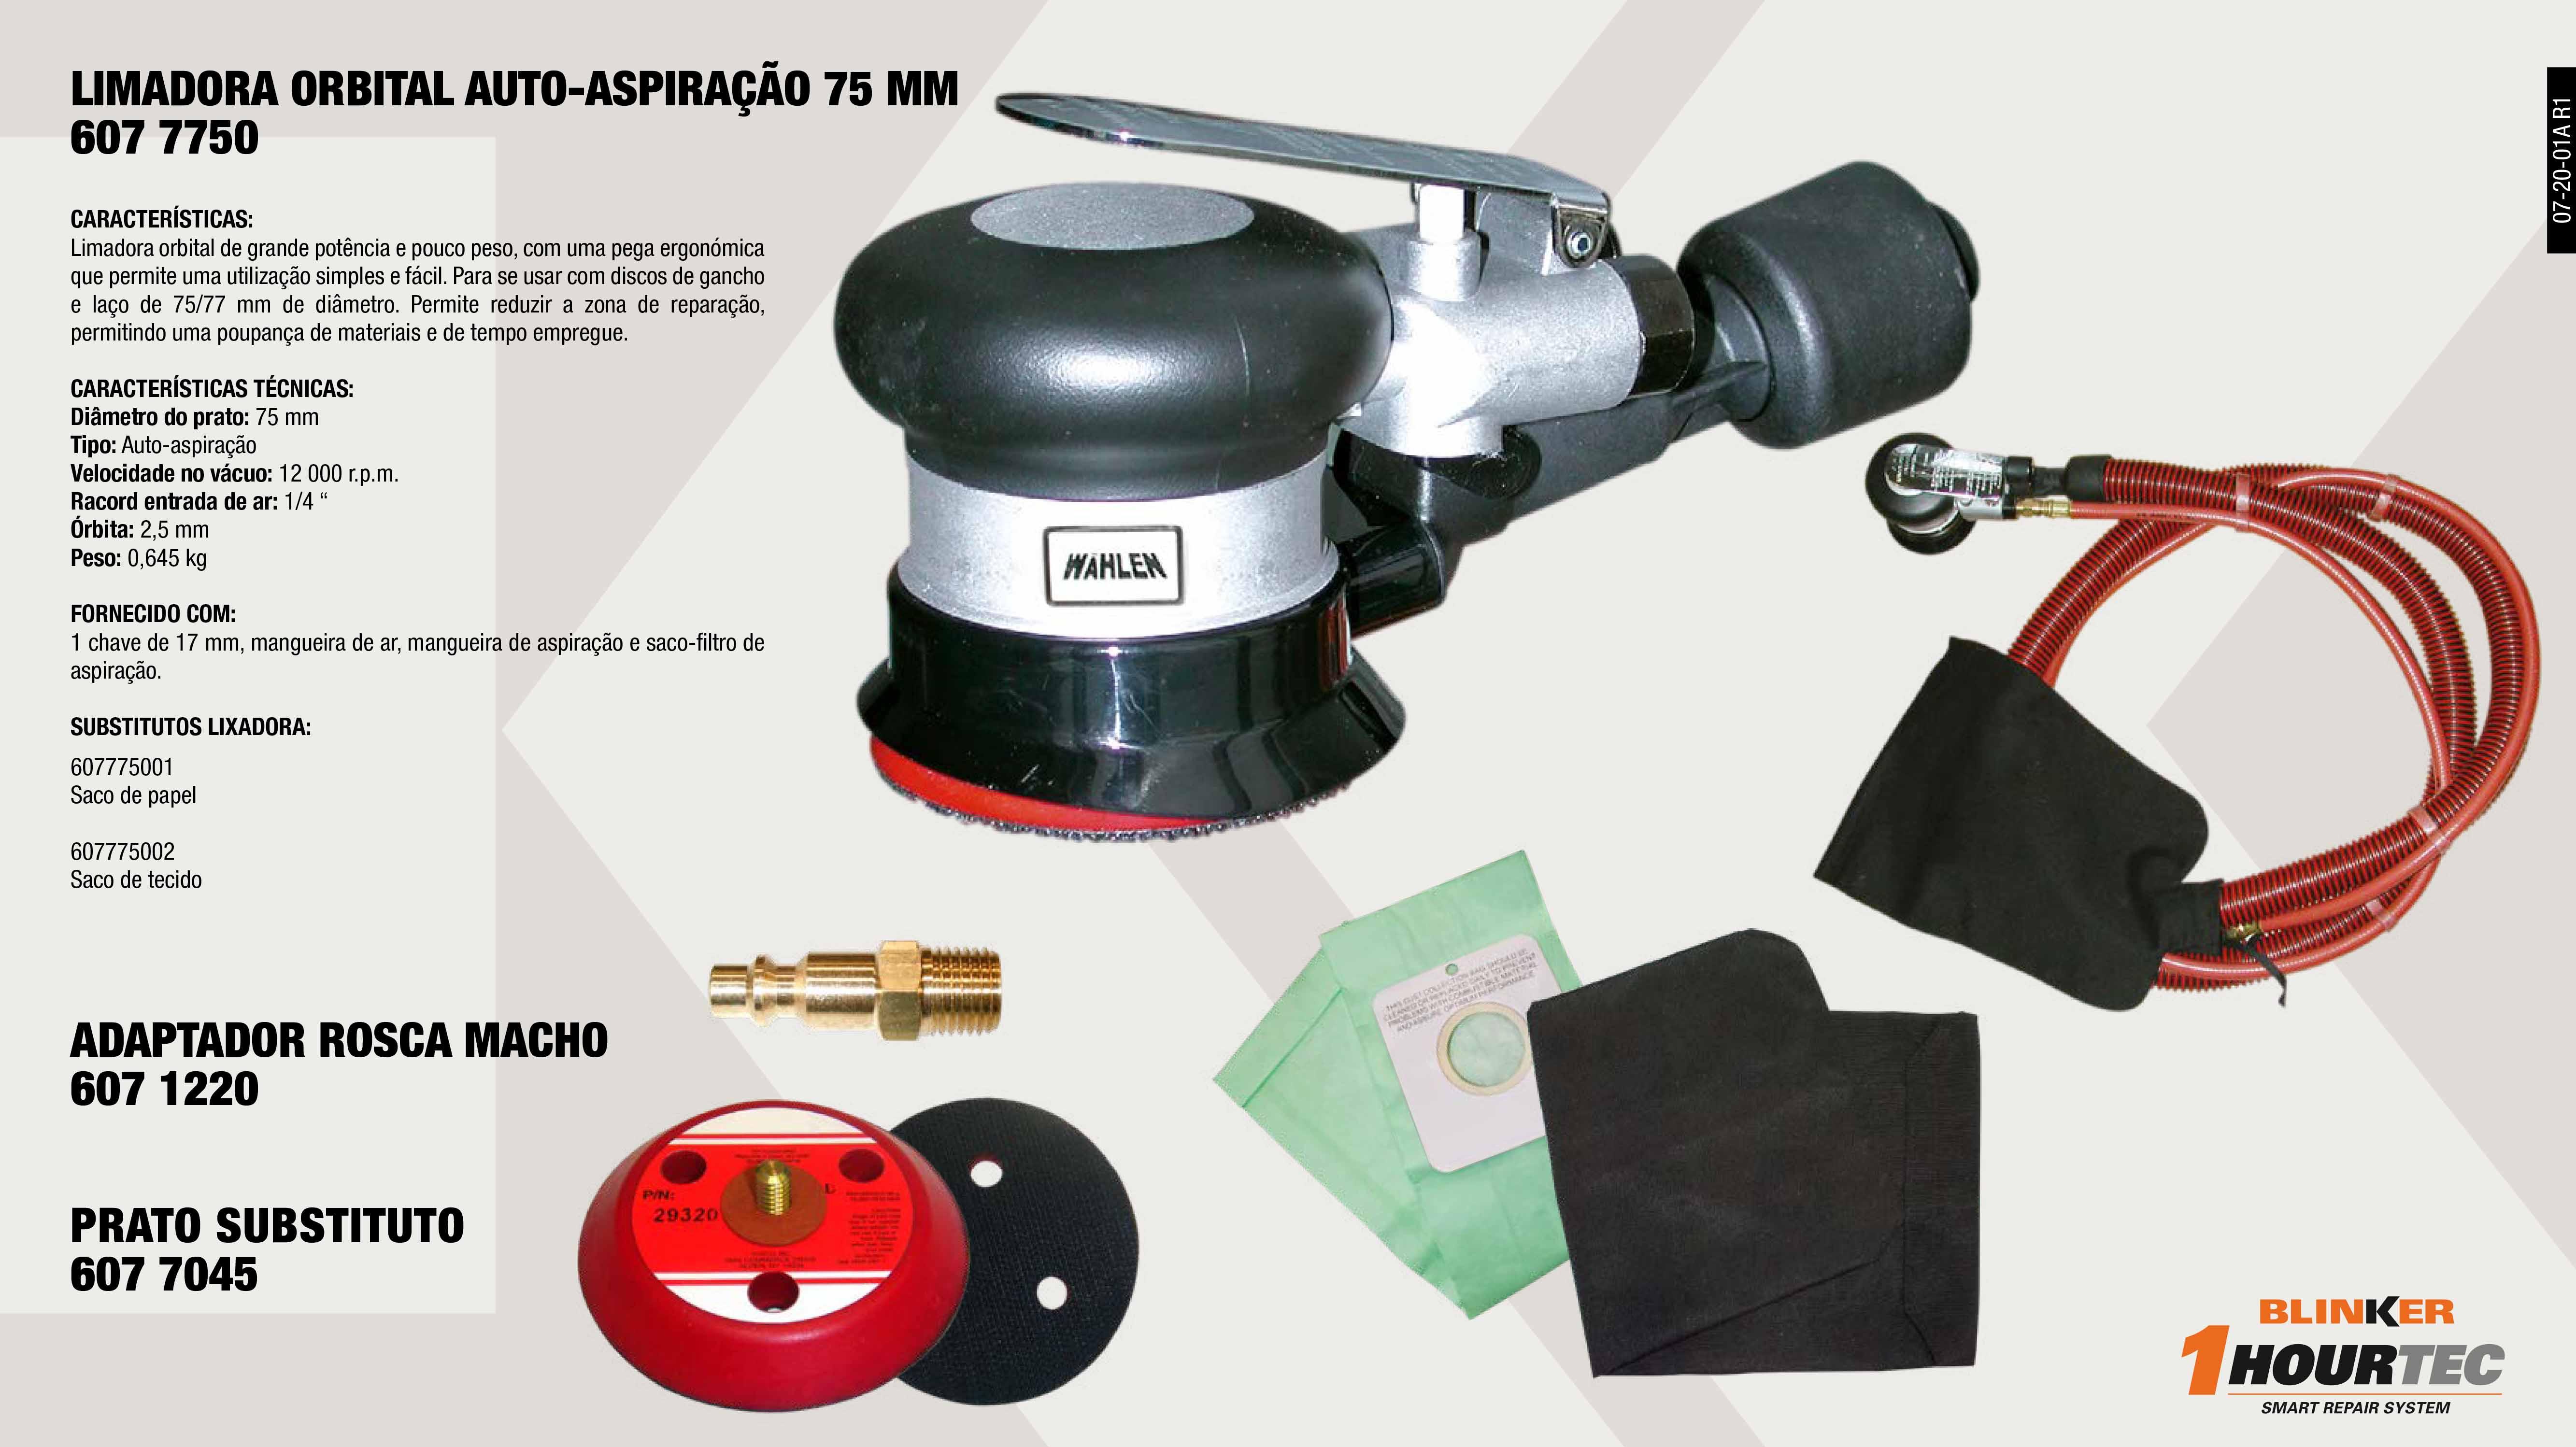 BOLSA PAPEL 6077750                                         ,  RECORD AR R/M 1/4 883L/MN                                   ,  BOLSA TELA 6077750                                          ,  LIXADORA ORBITAL AUTO-ASPIRACÃO                             ,